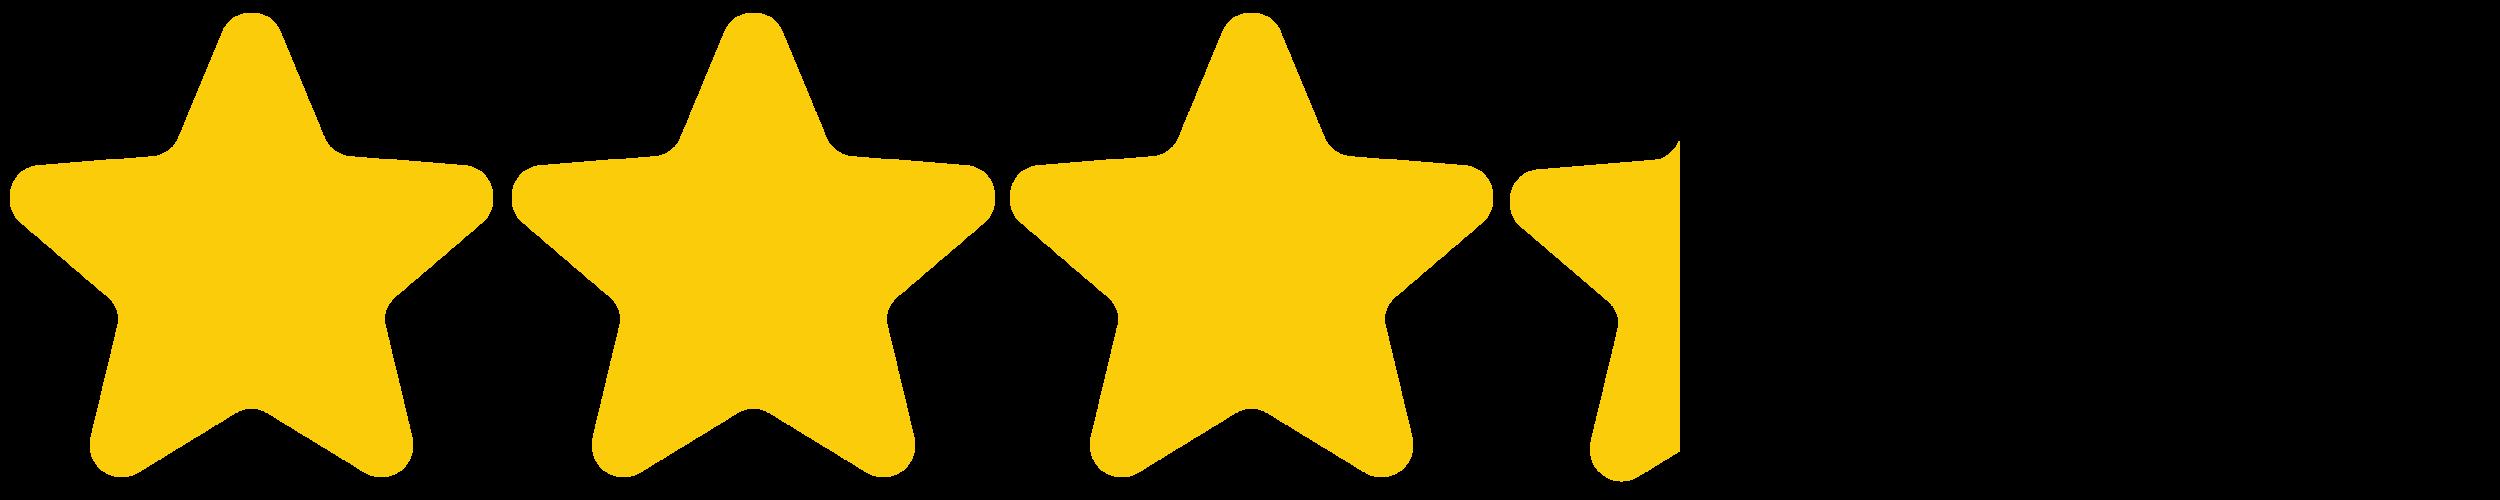 - (3.25 stars)